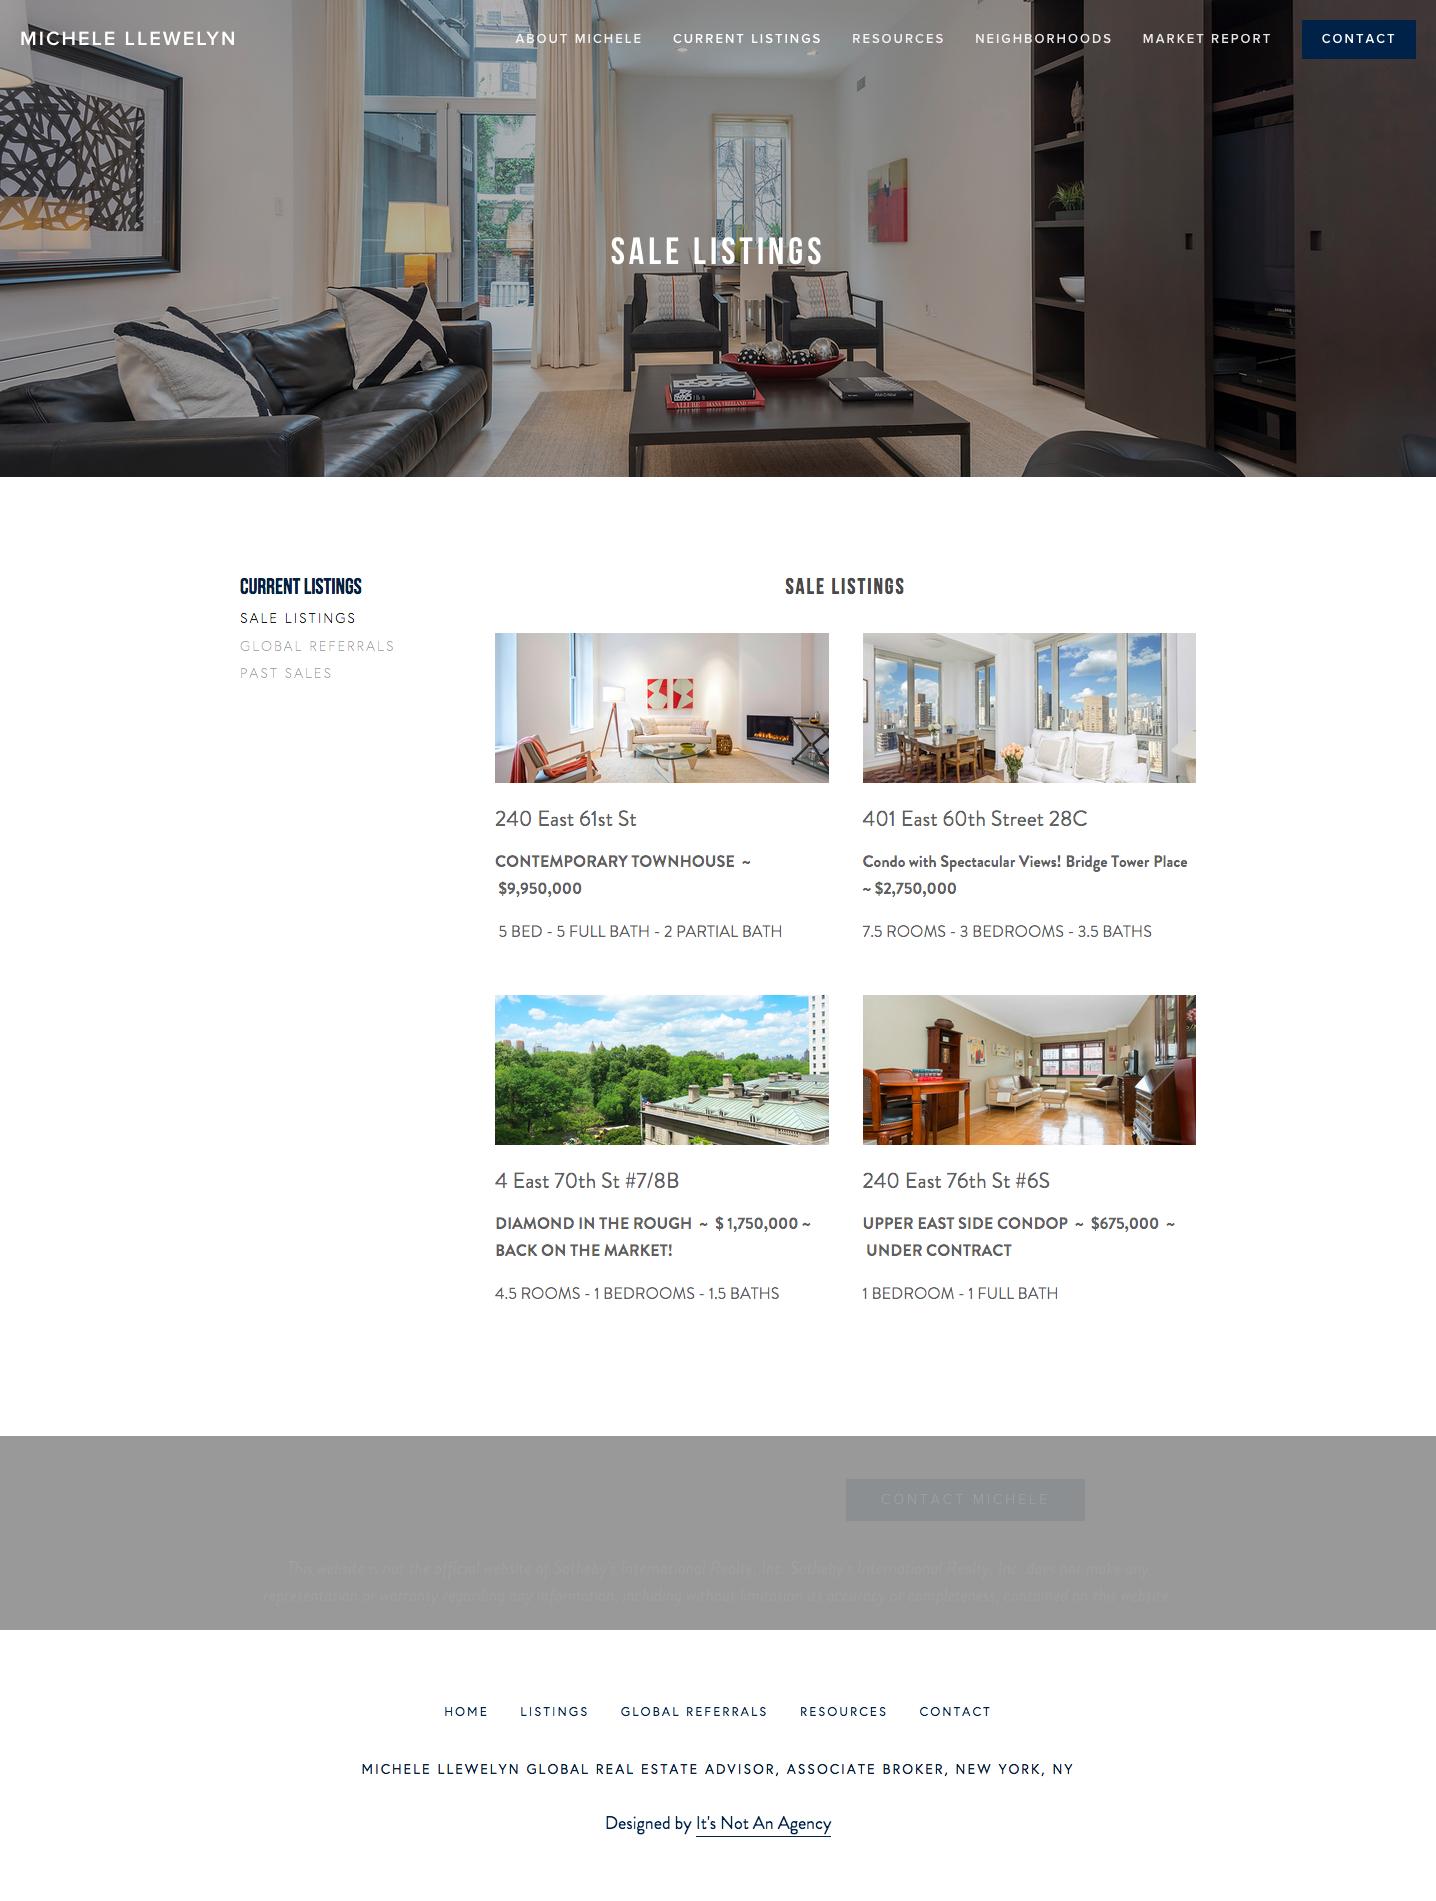 Real Estate Website_Michele Llewelyn5.png